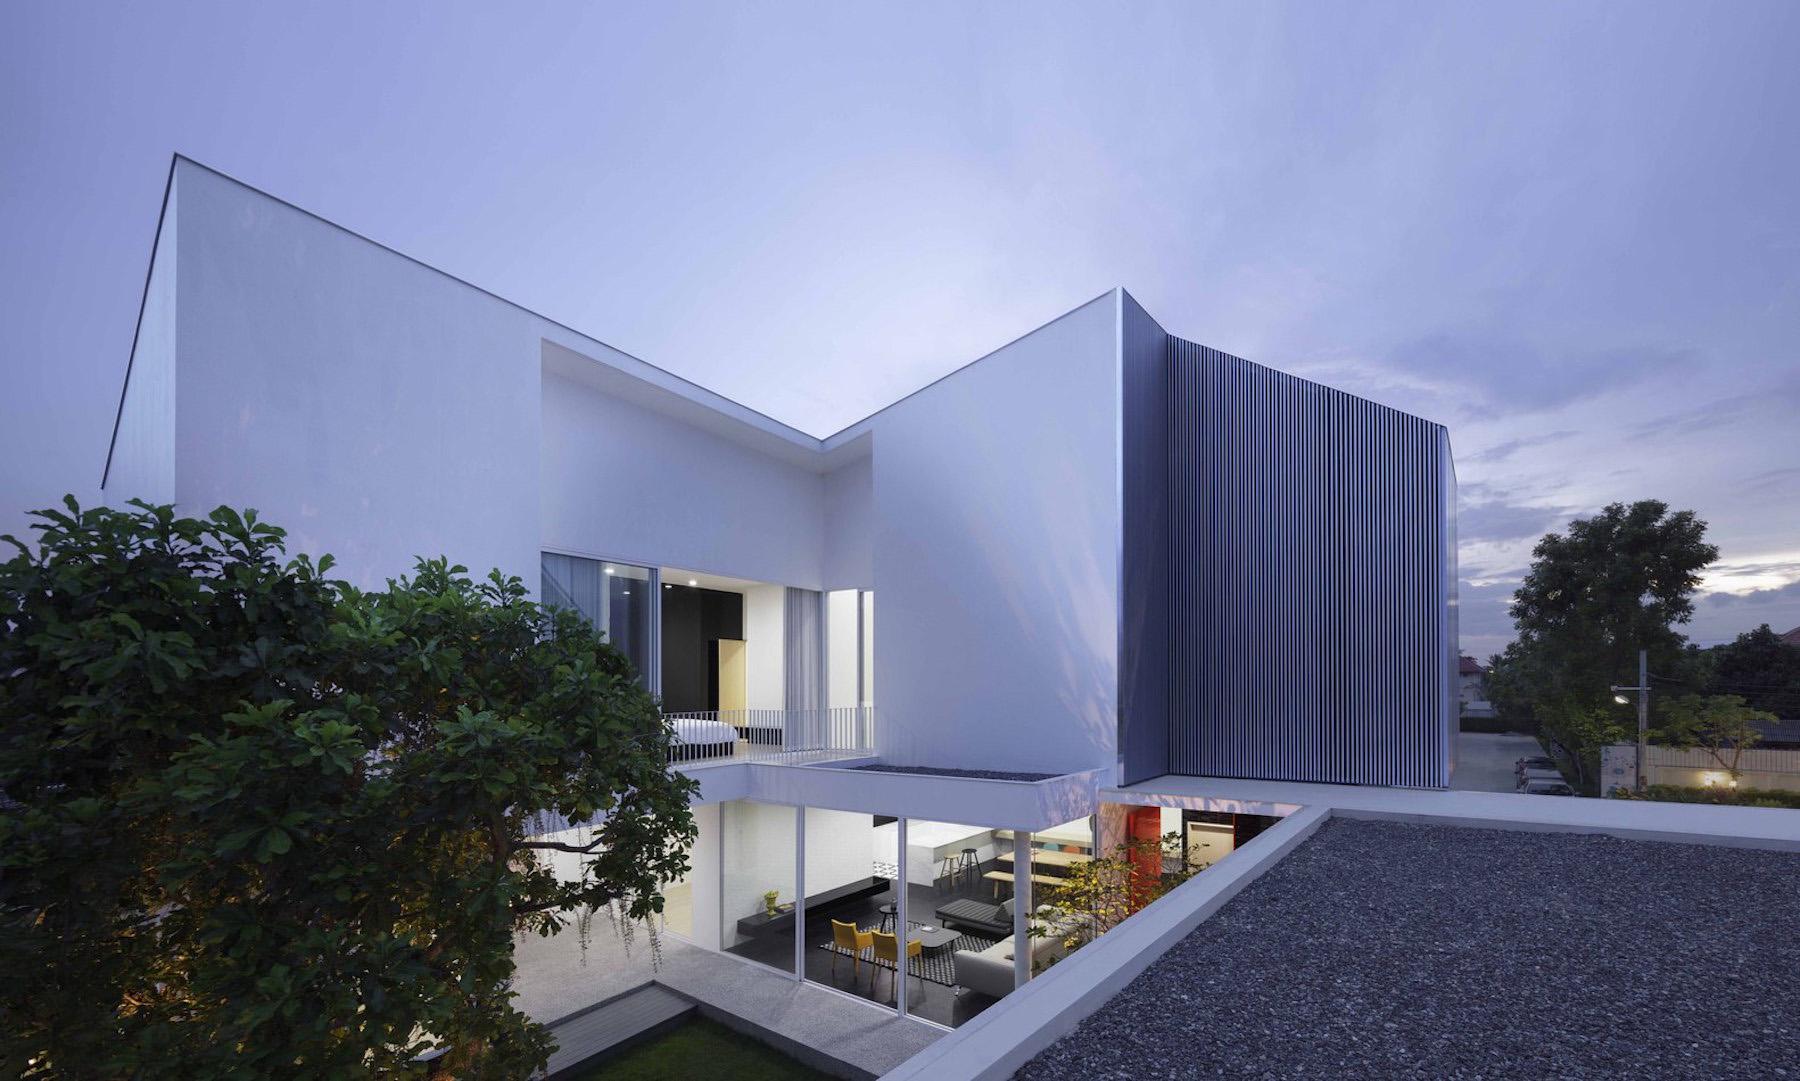 iGNANT-Architecture-Ayutt-And-Associates-Design-White-Box-House-25